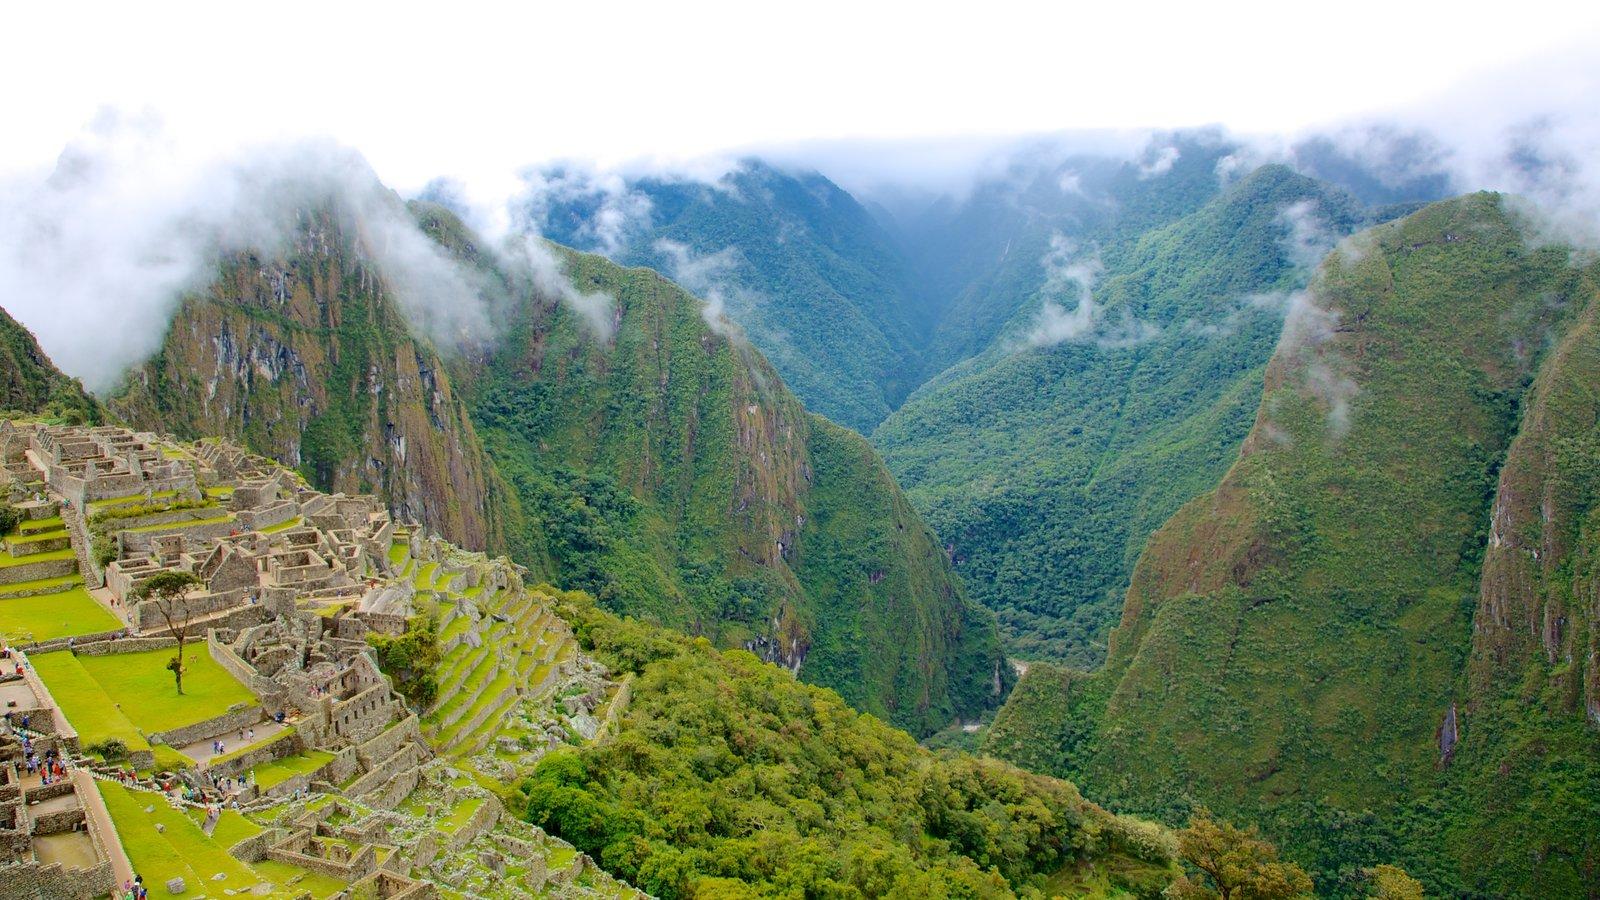 Machu Picchu showing mountains and a ruin